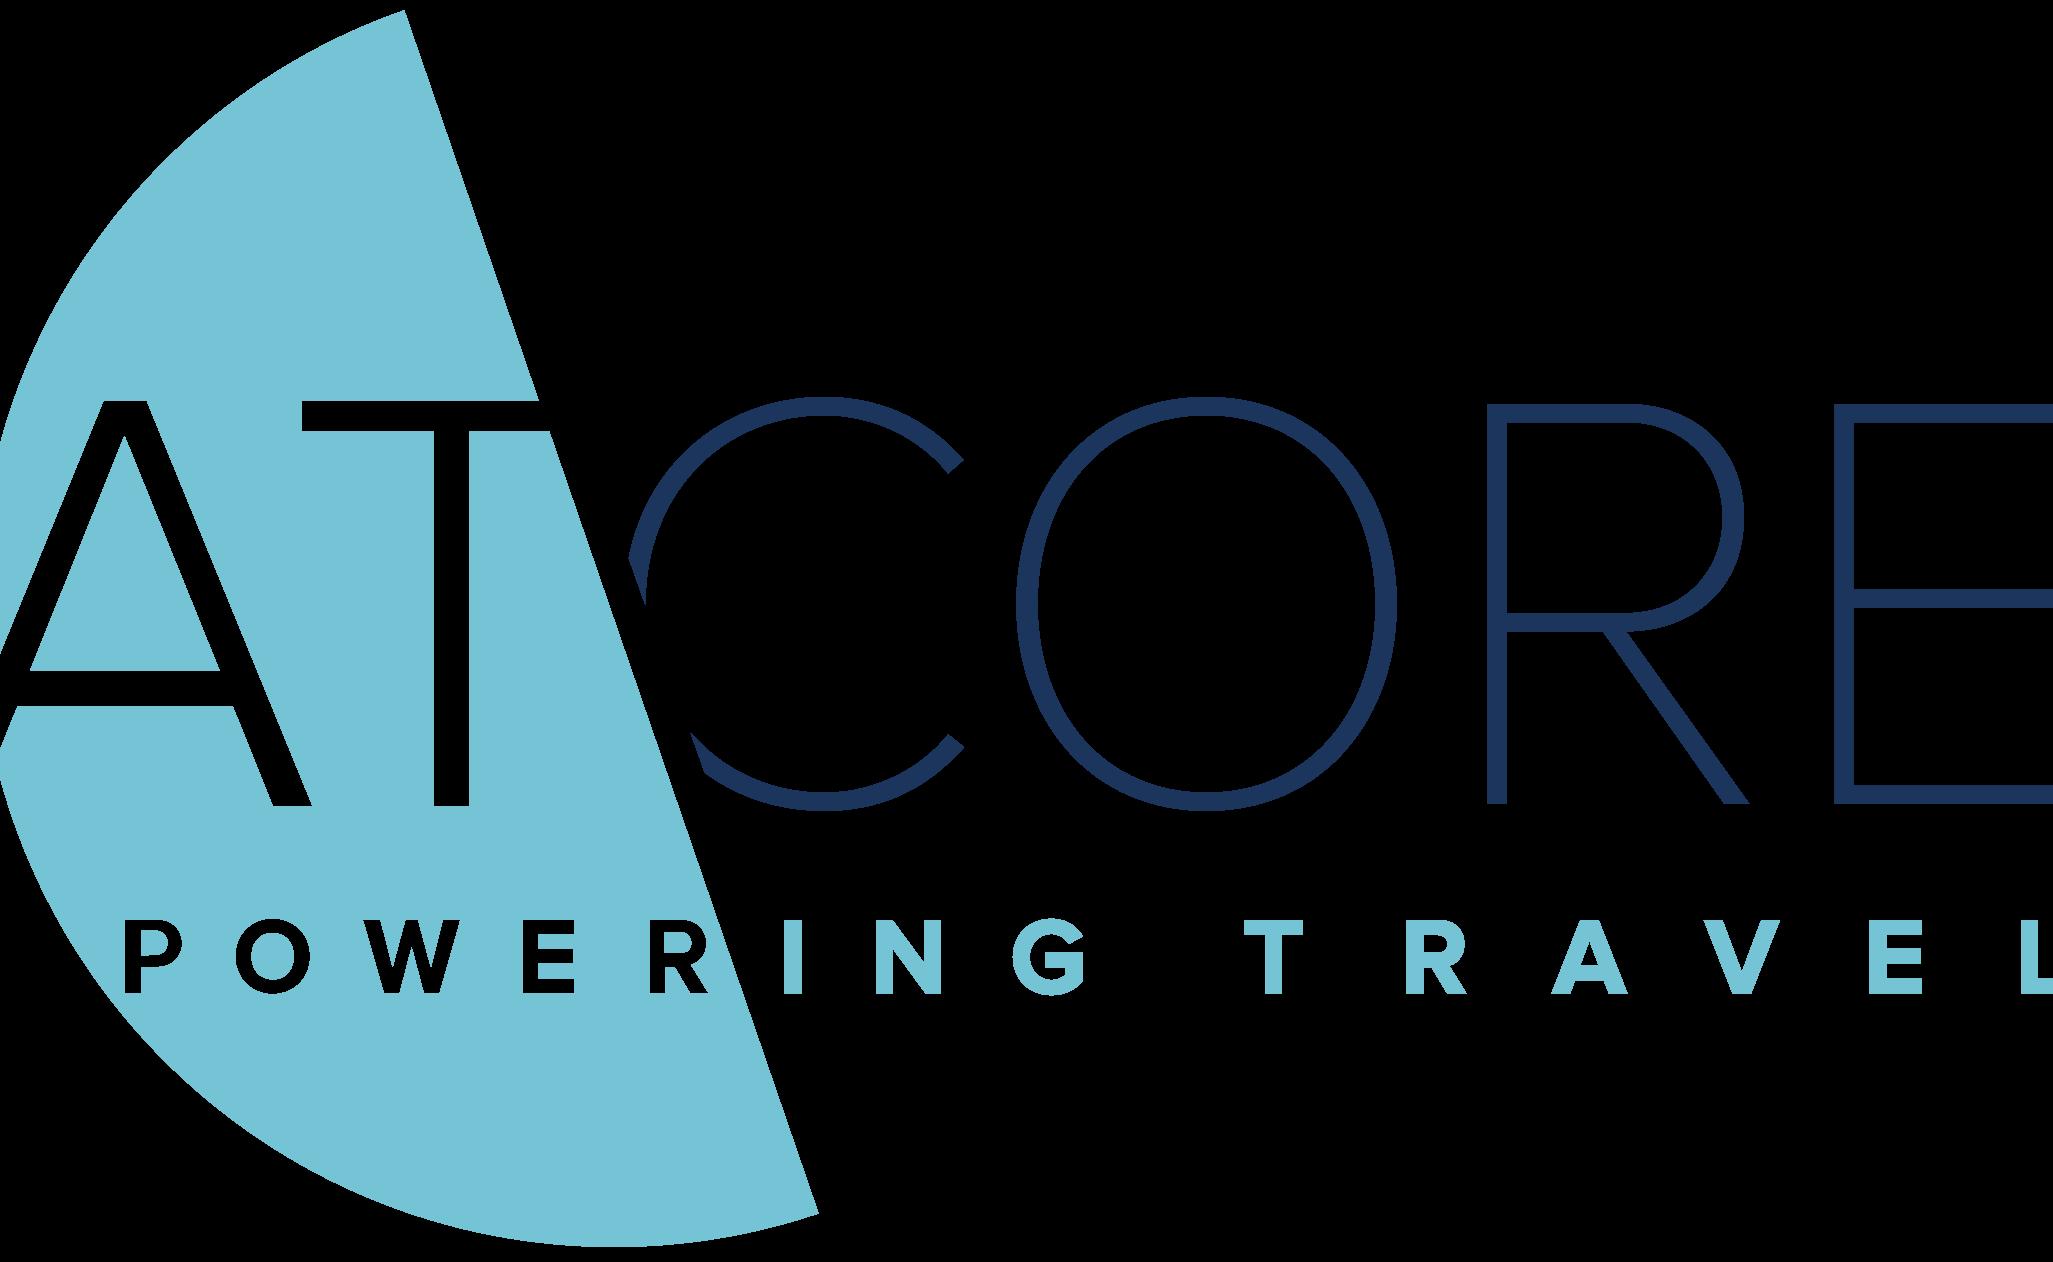 Atcore logo image